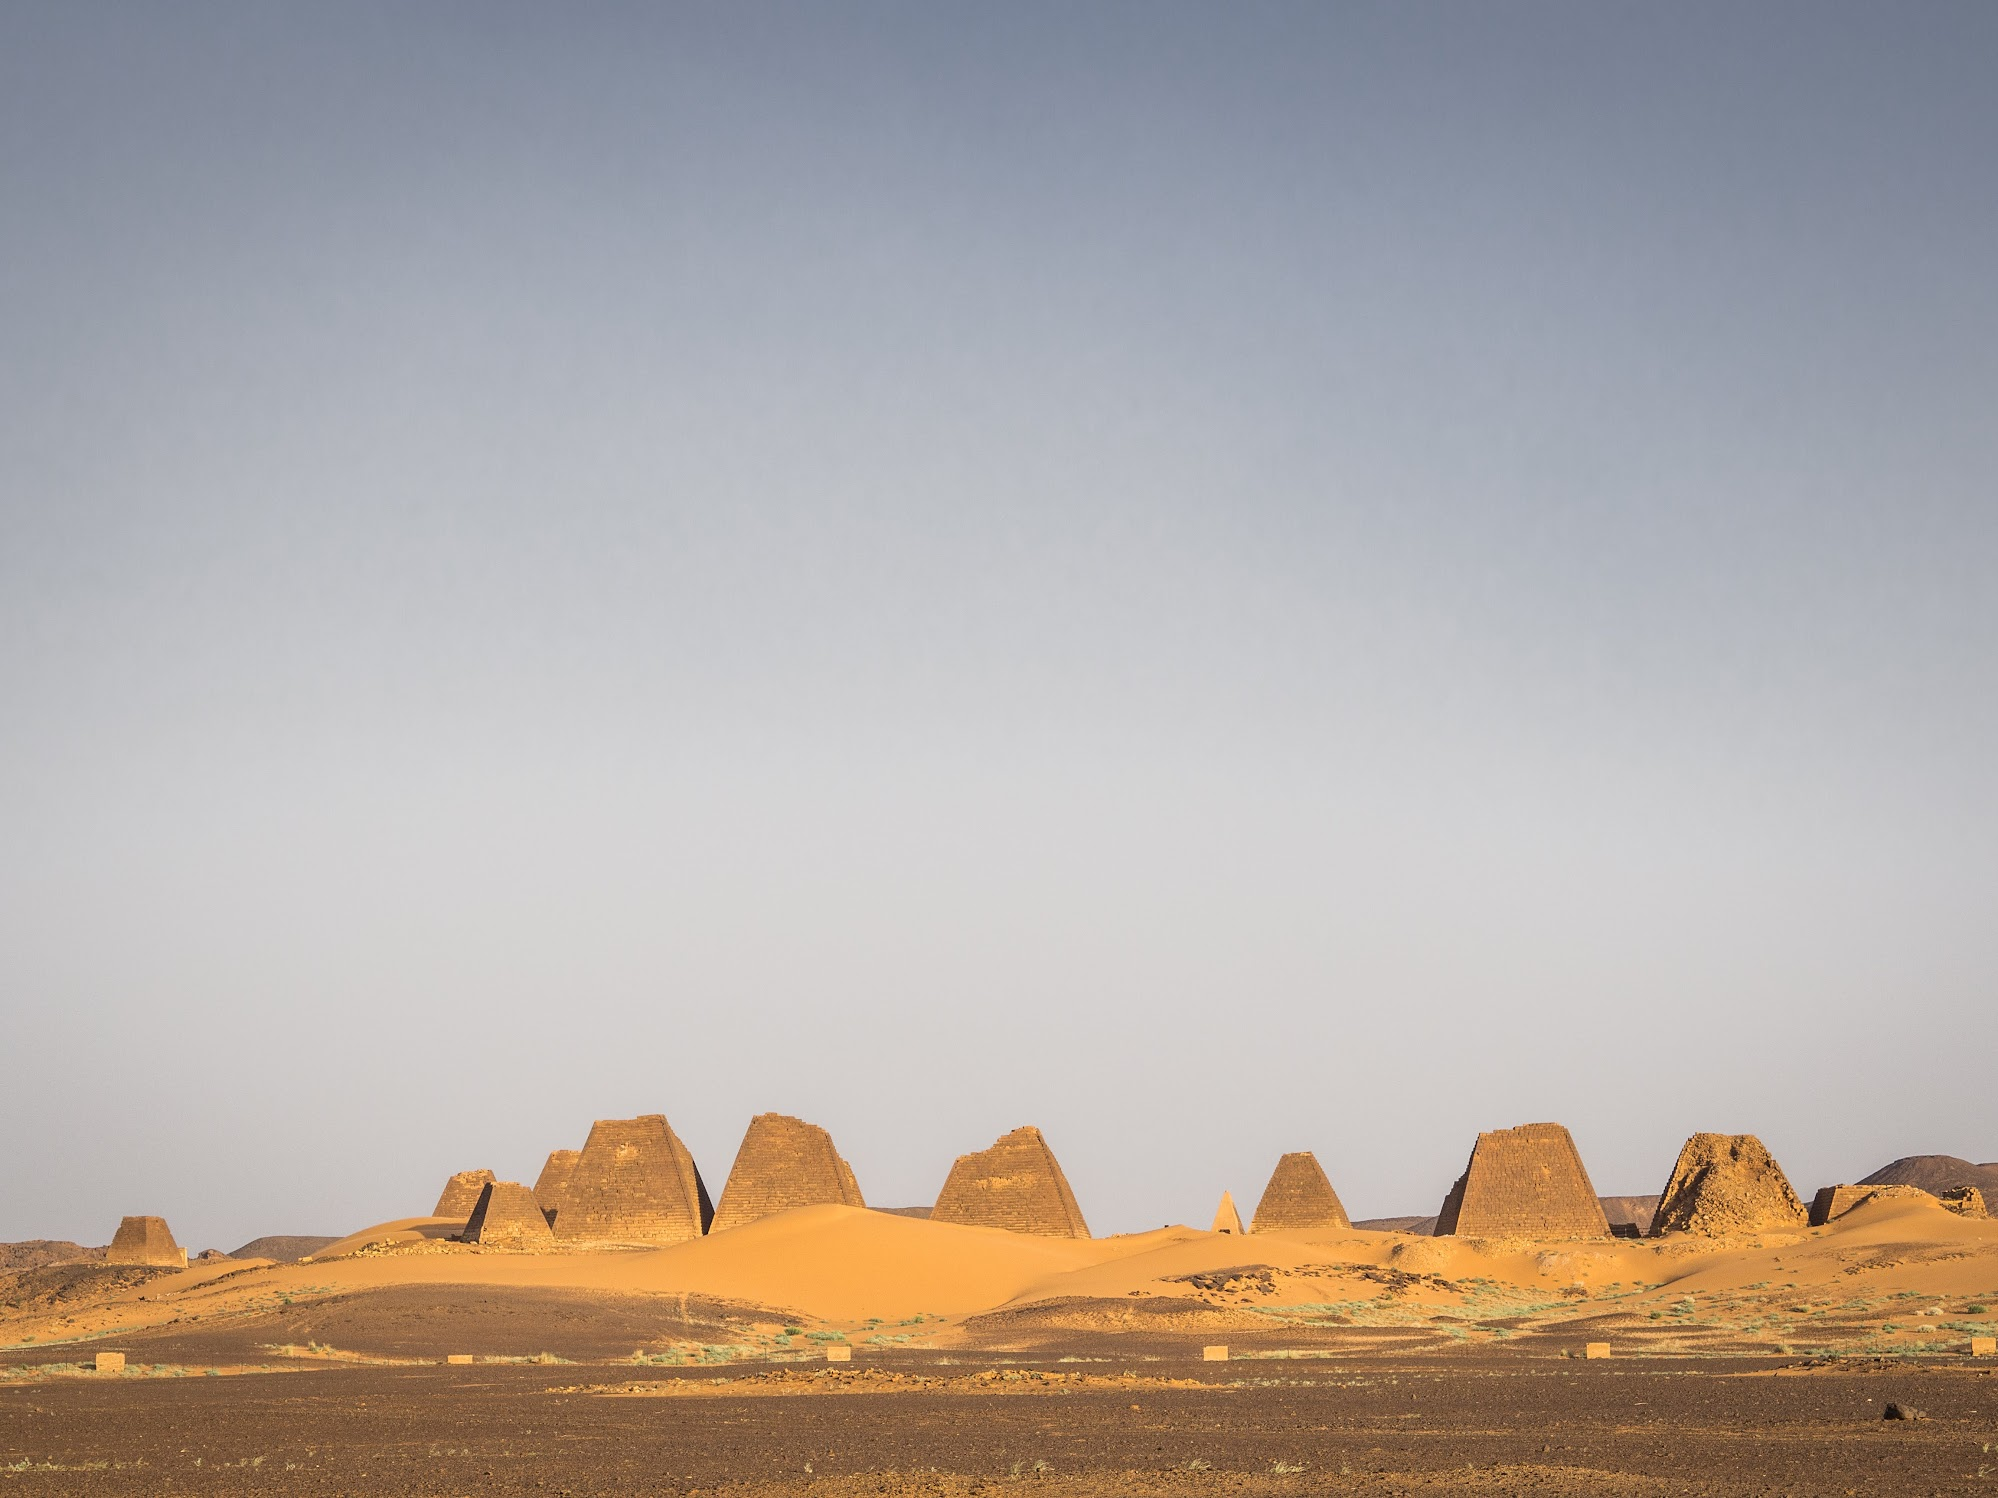 Meroe skyline